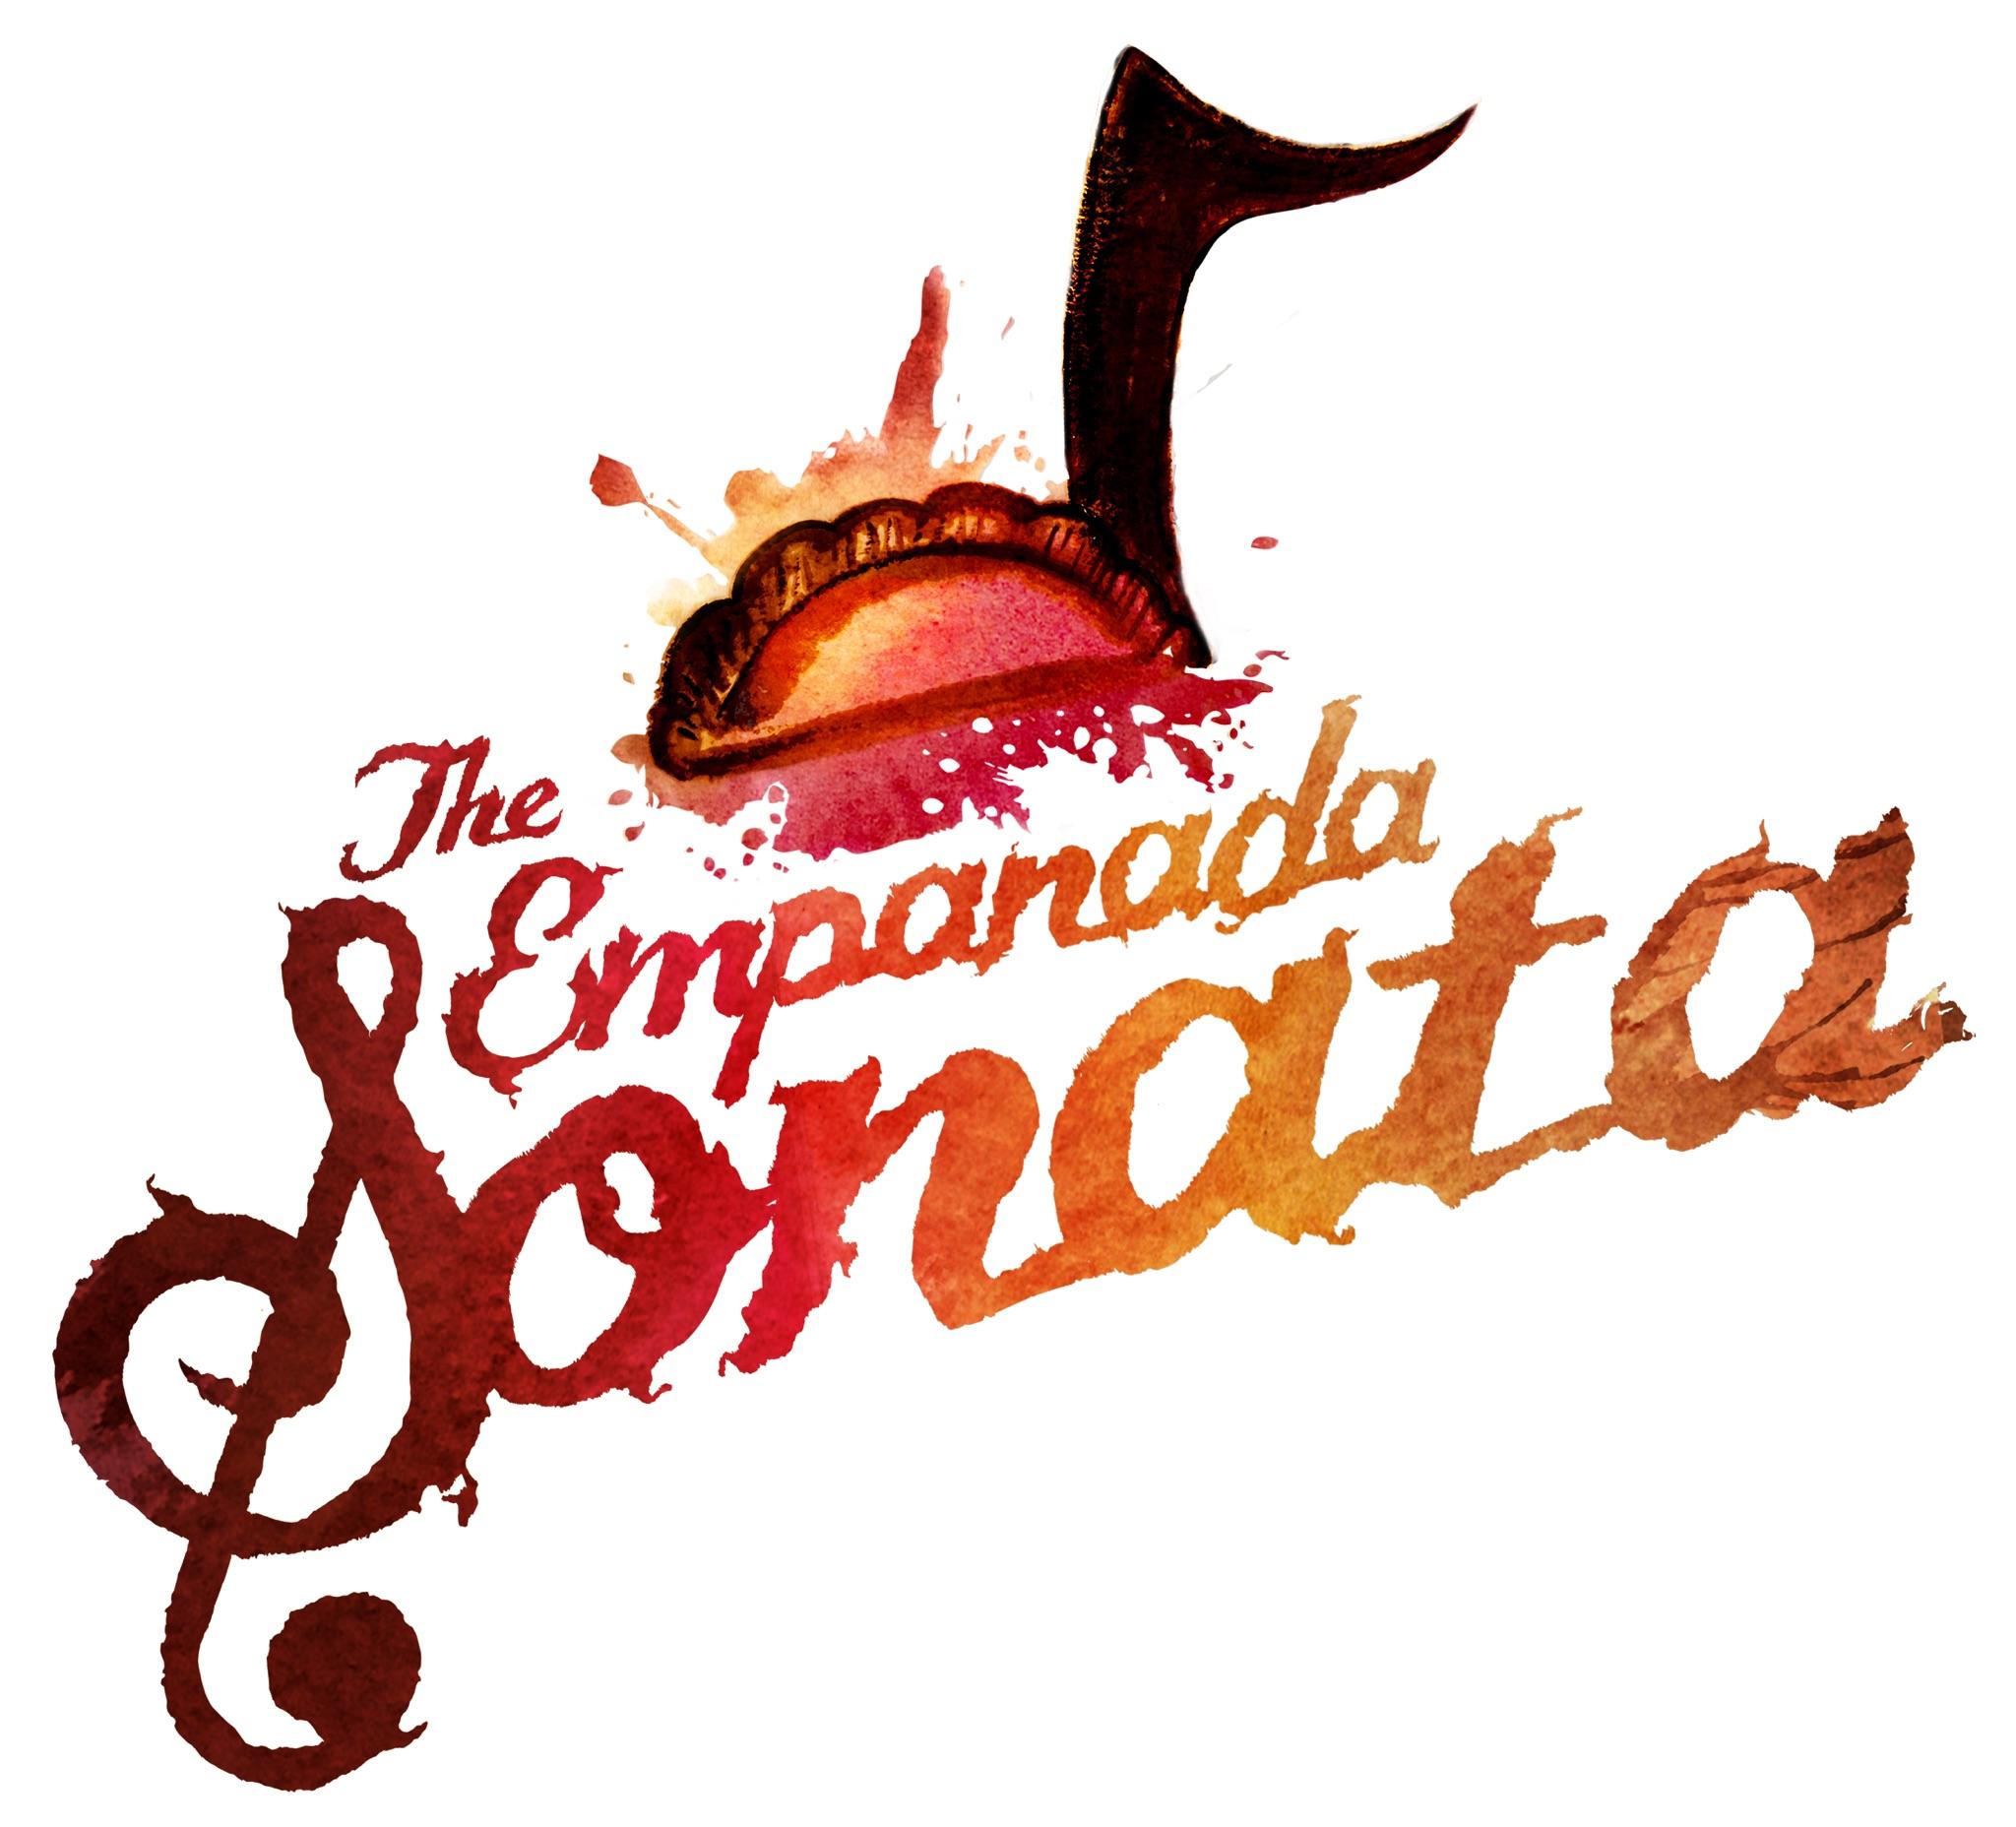 empanada-sonata-logo-food-truck.jpg